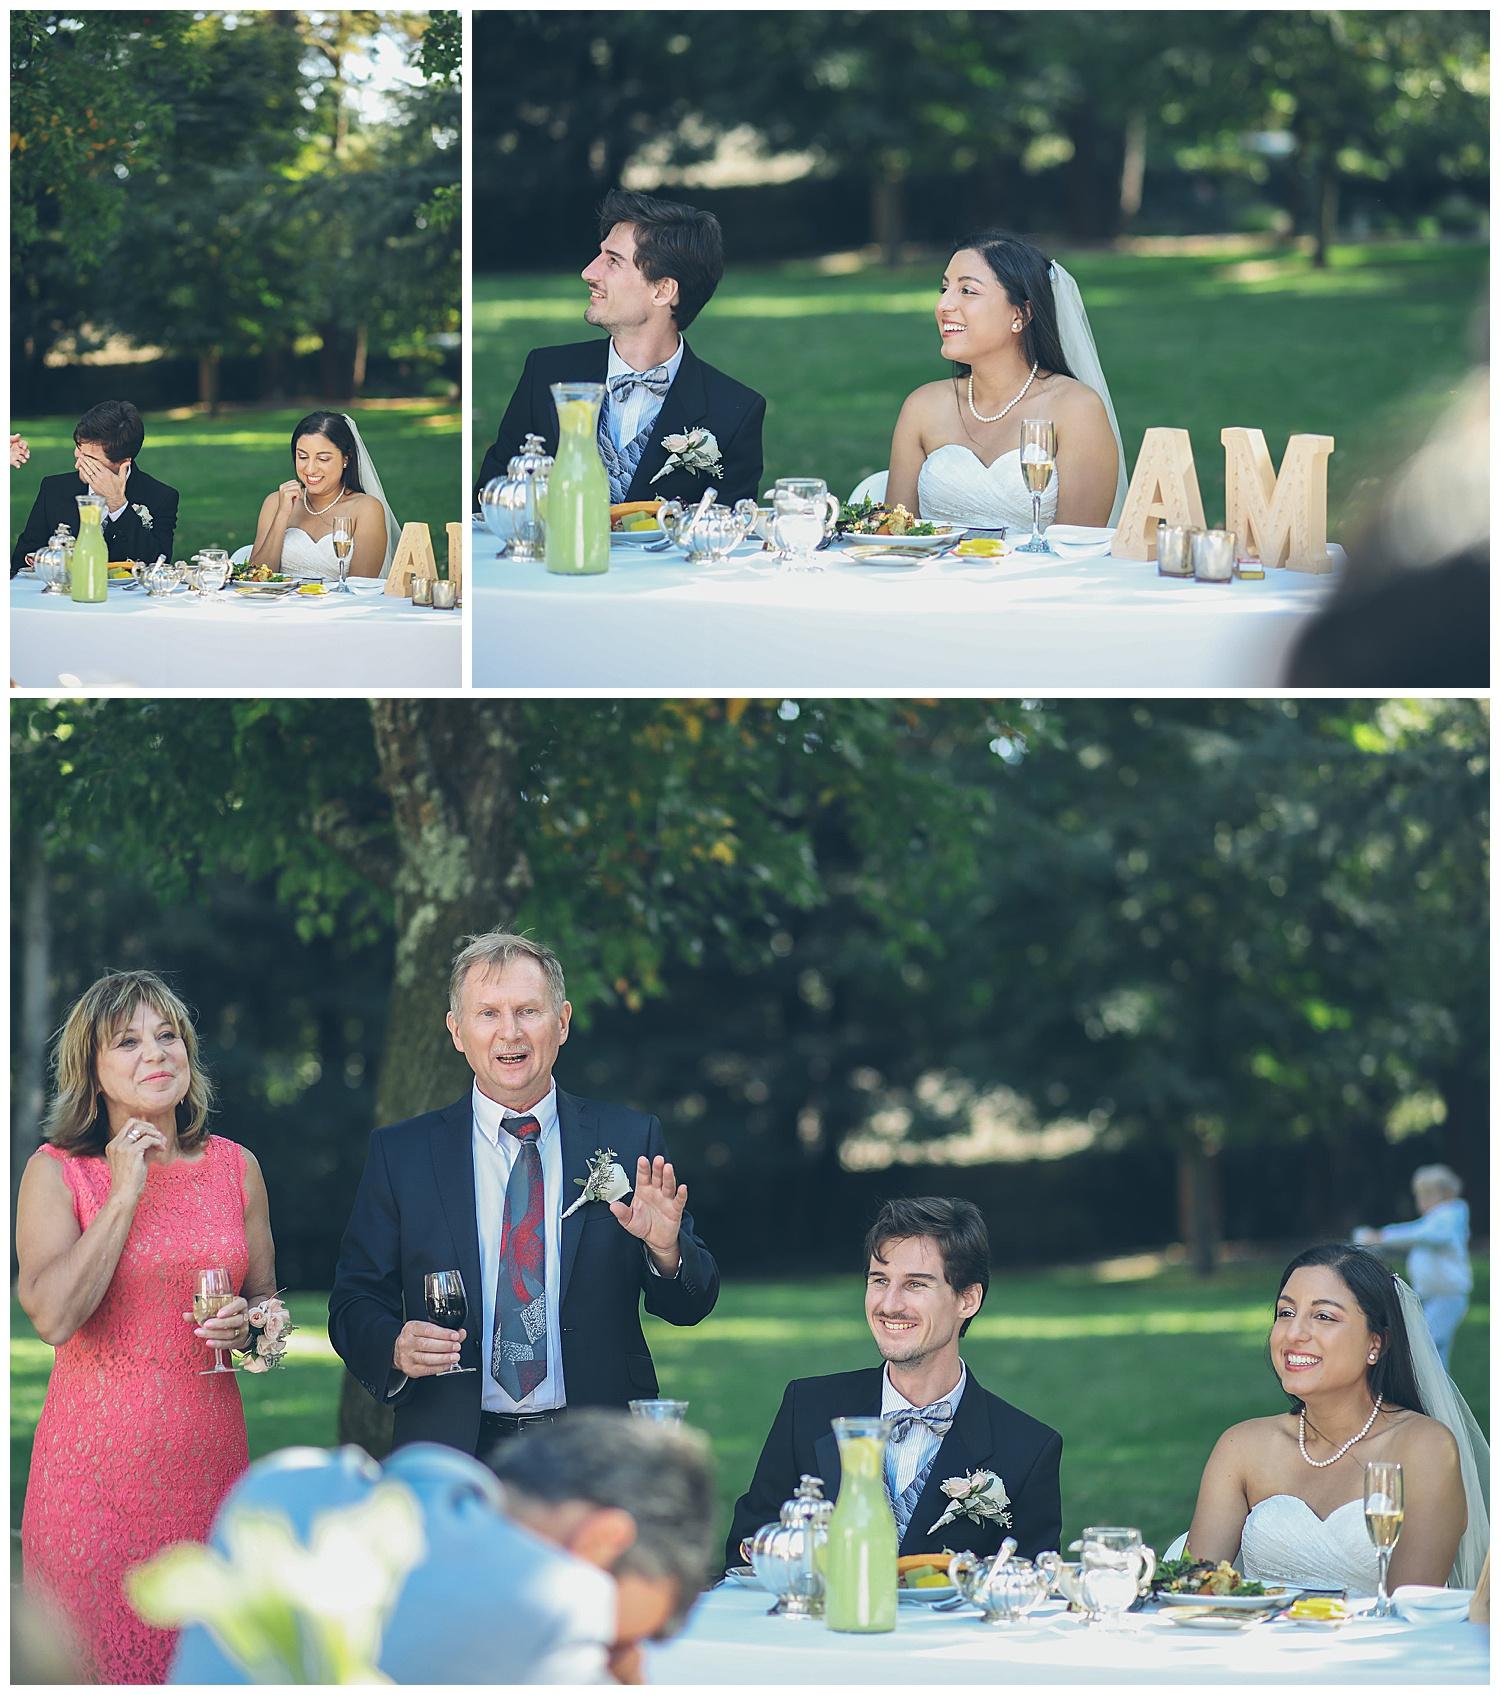 khariza-rae-photography-bay-area-wedding-photographer_0205.jpg